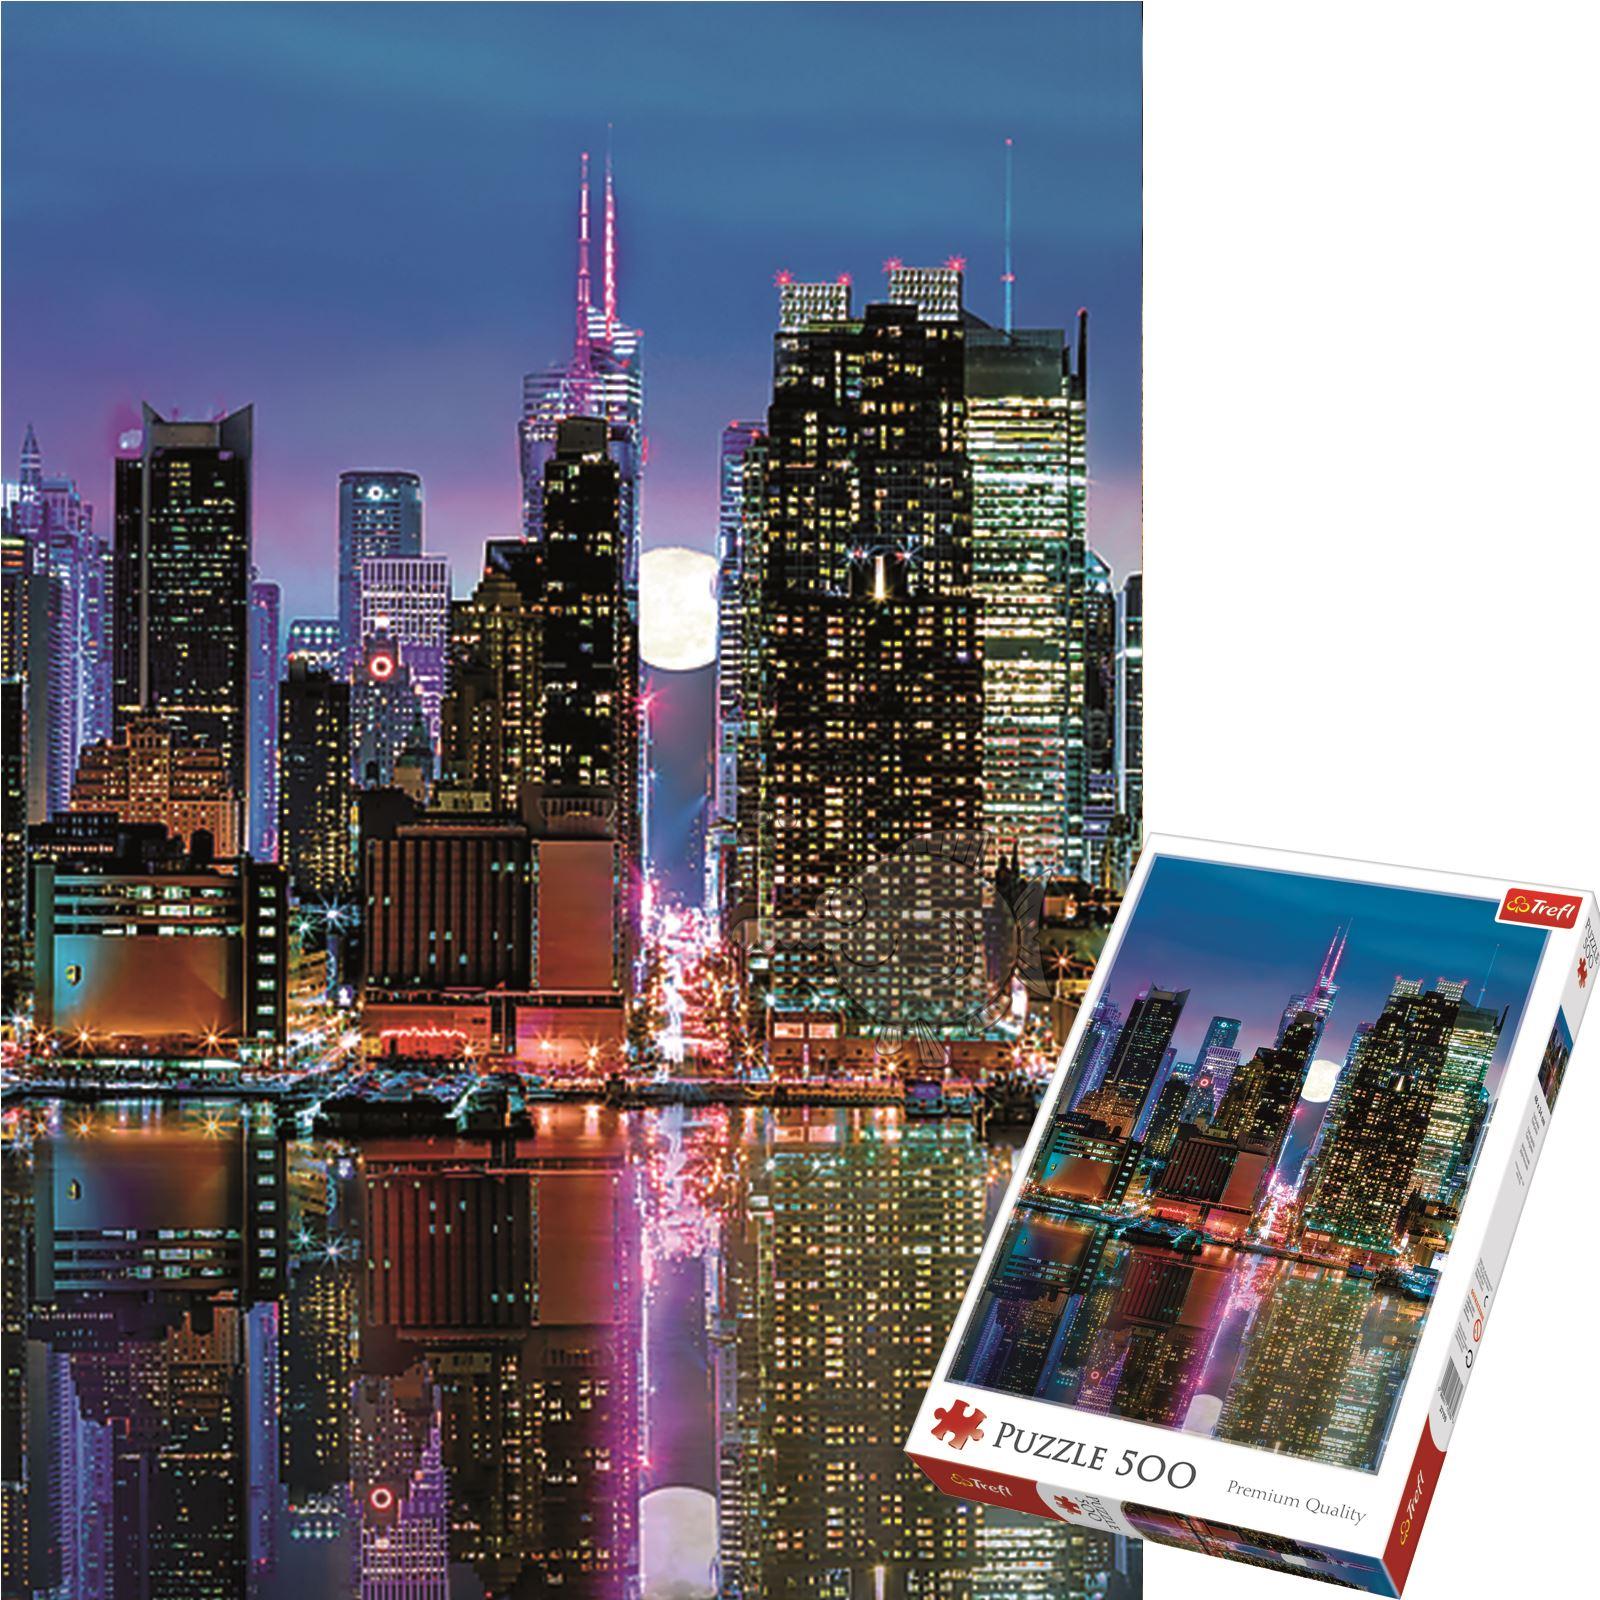 Trefl-300-500-1000-1500-2000-3000-4000-6000-Piece-Jigsaw-Puzzle-Landscapes-City thumbnail 124